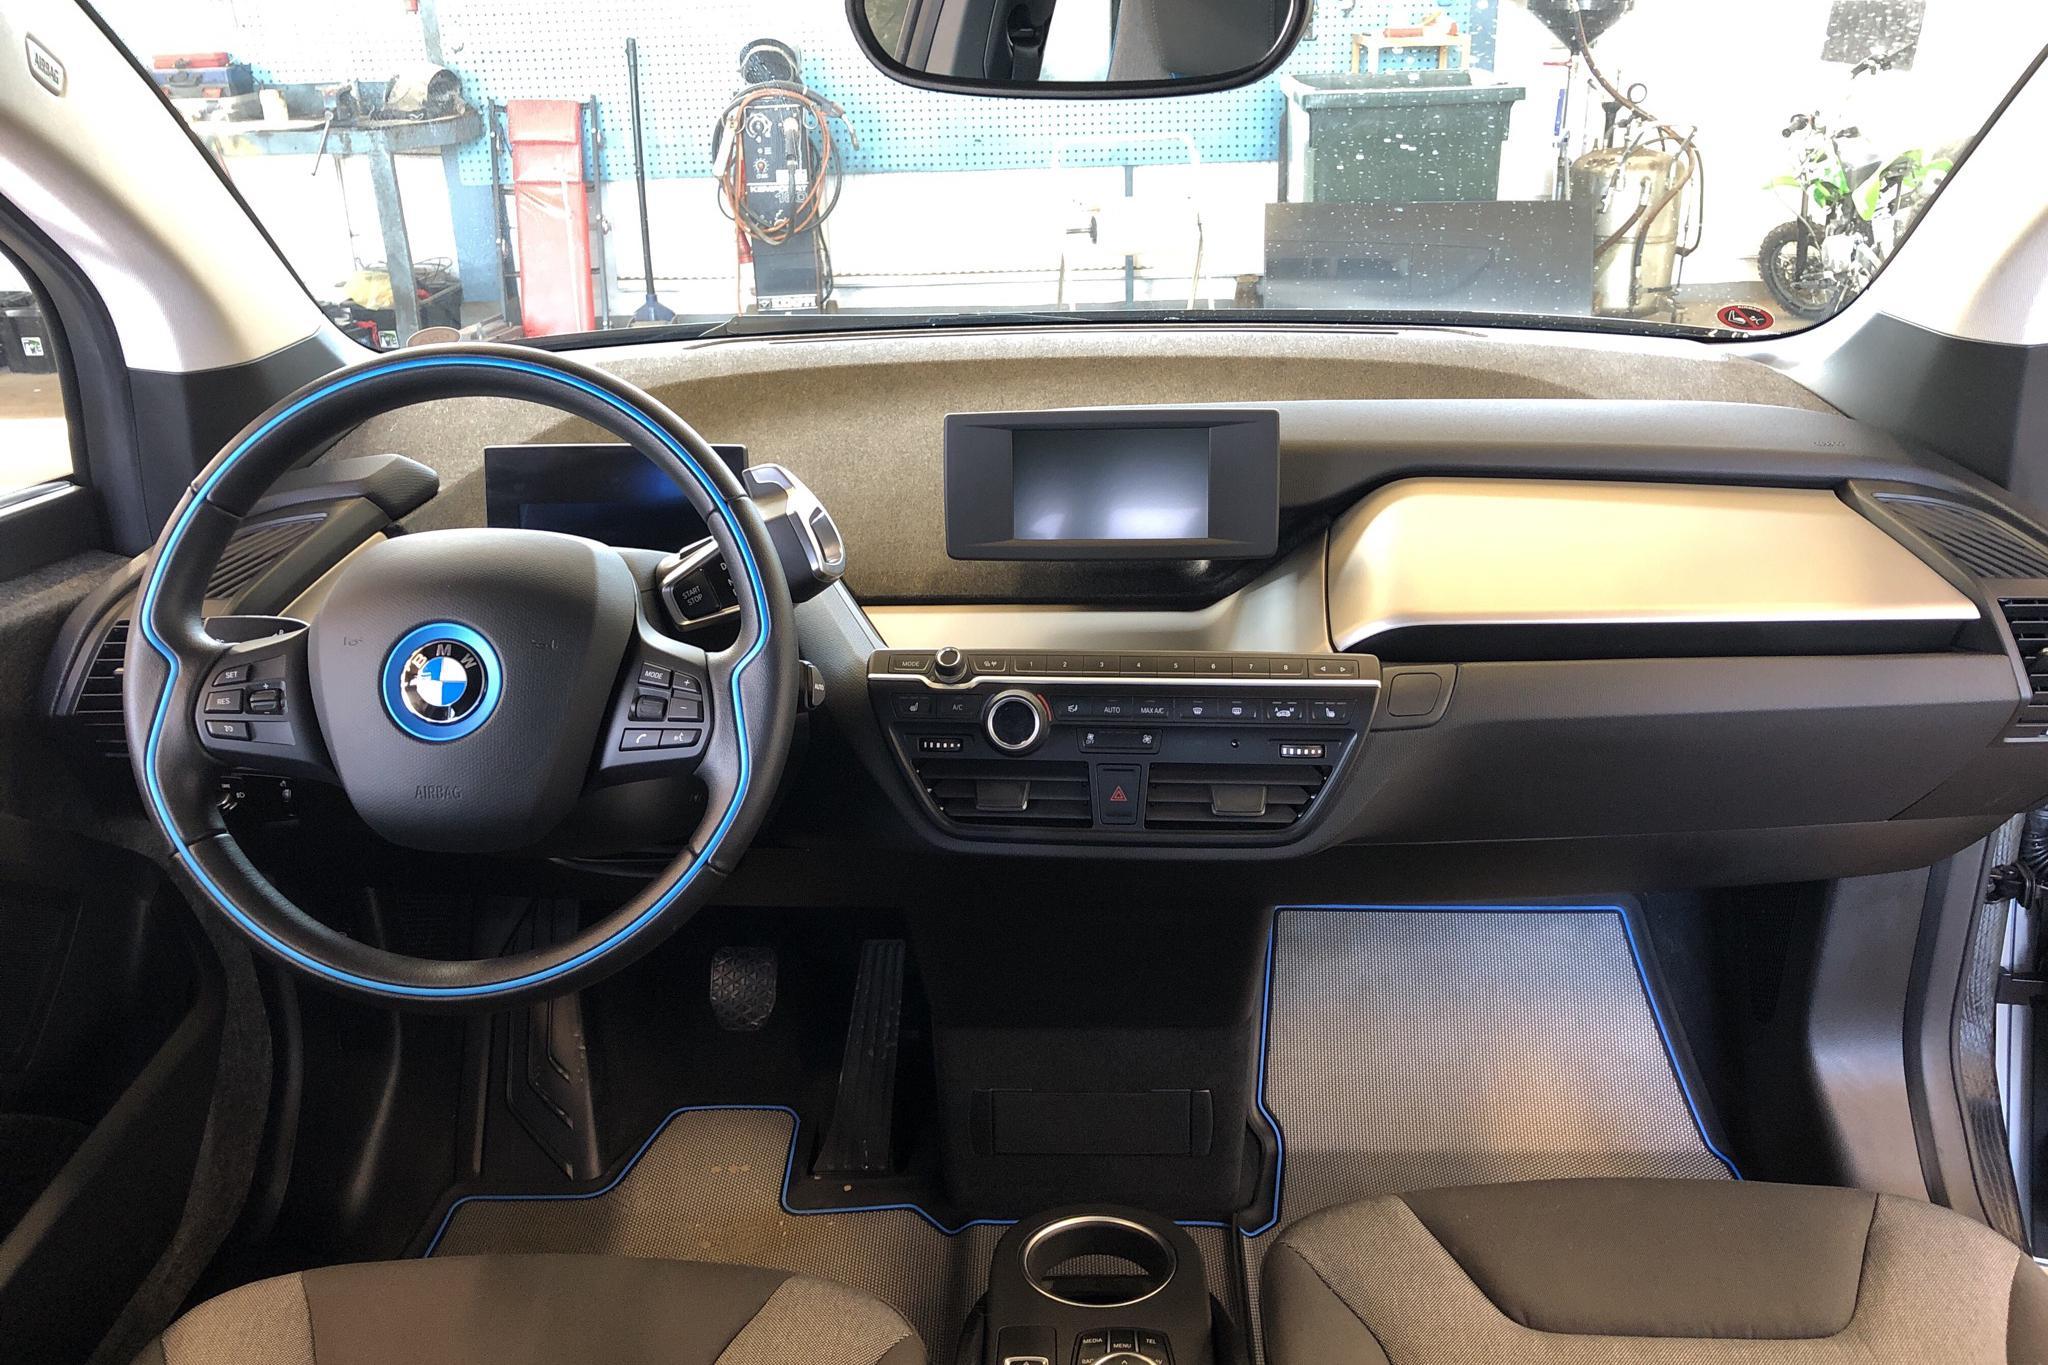 BMW i3 94Ah, I01 (170hk) - 18 230 km - Automatic - white - 2018